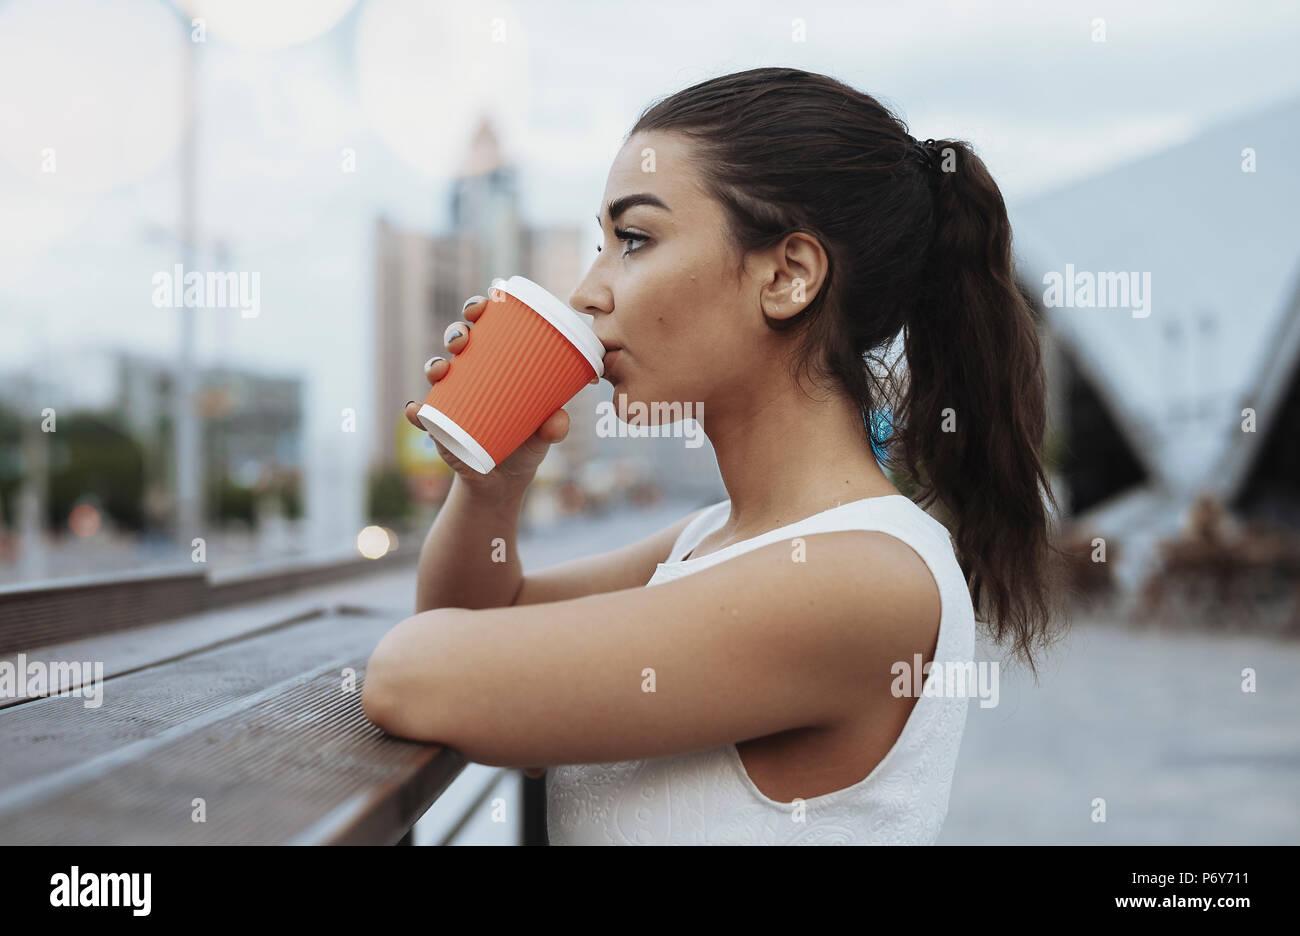 Junge attraktive Frau trinkt Kaffee. Stockbild